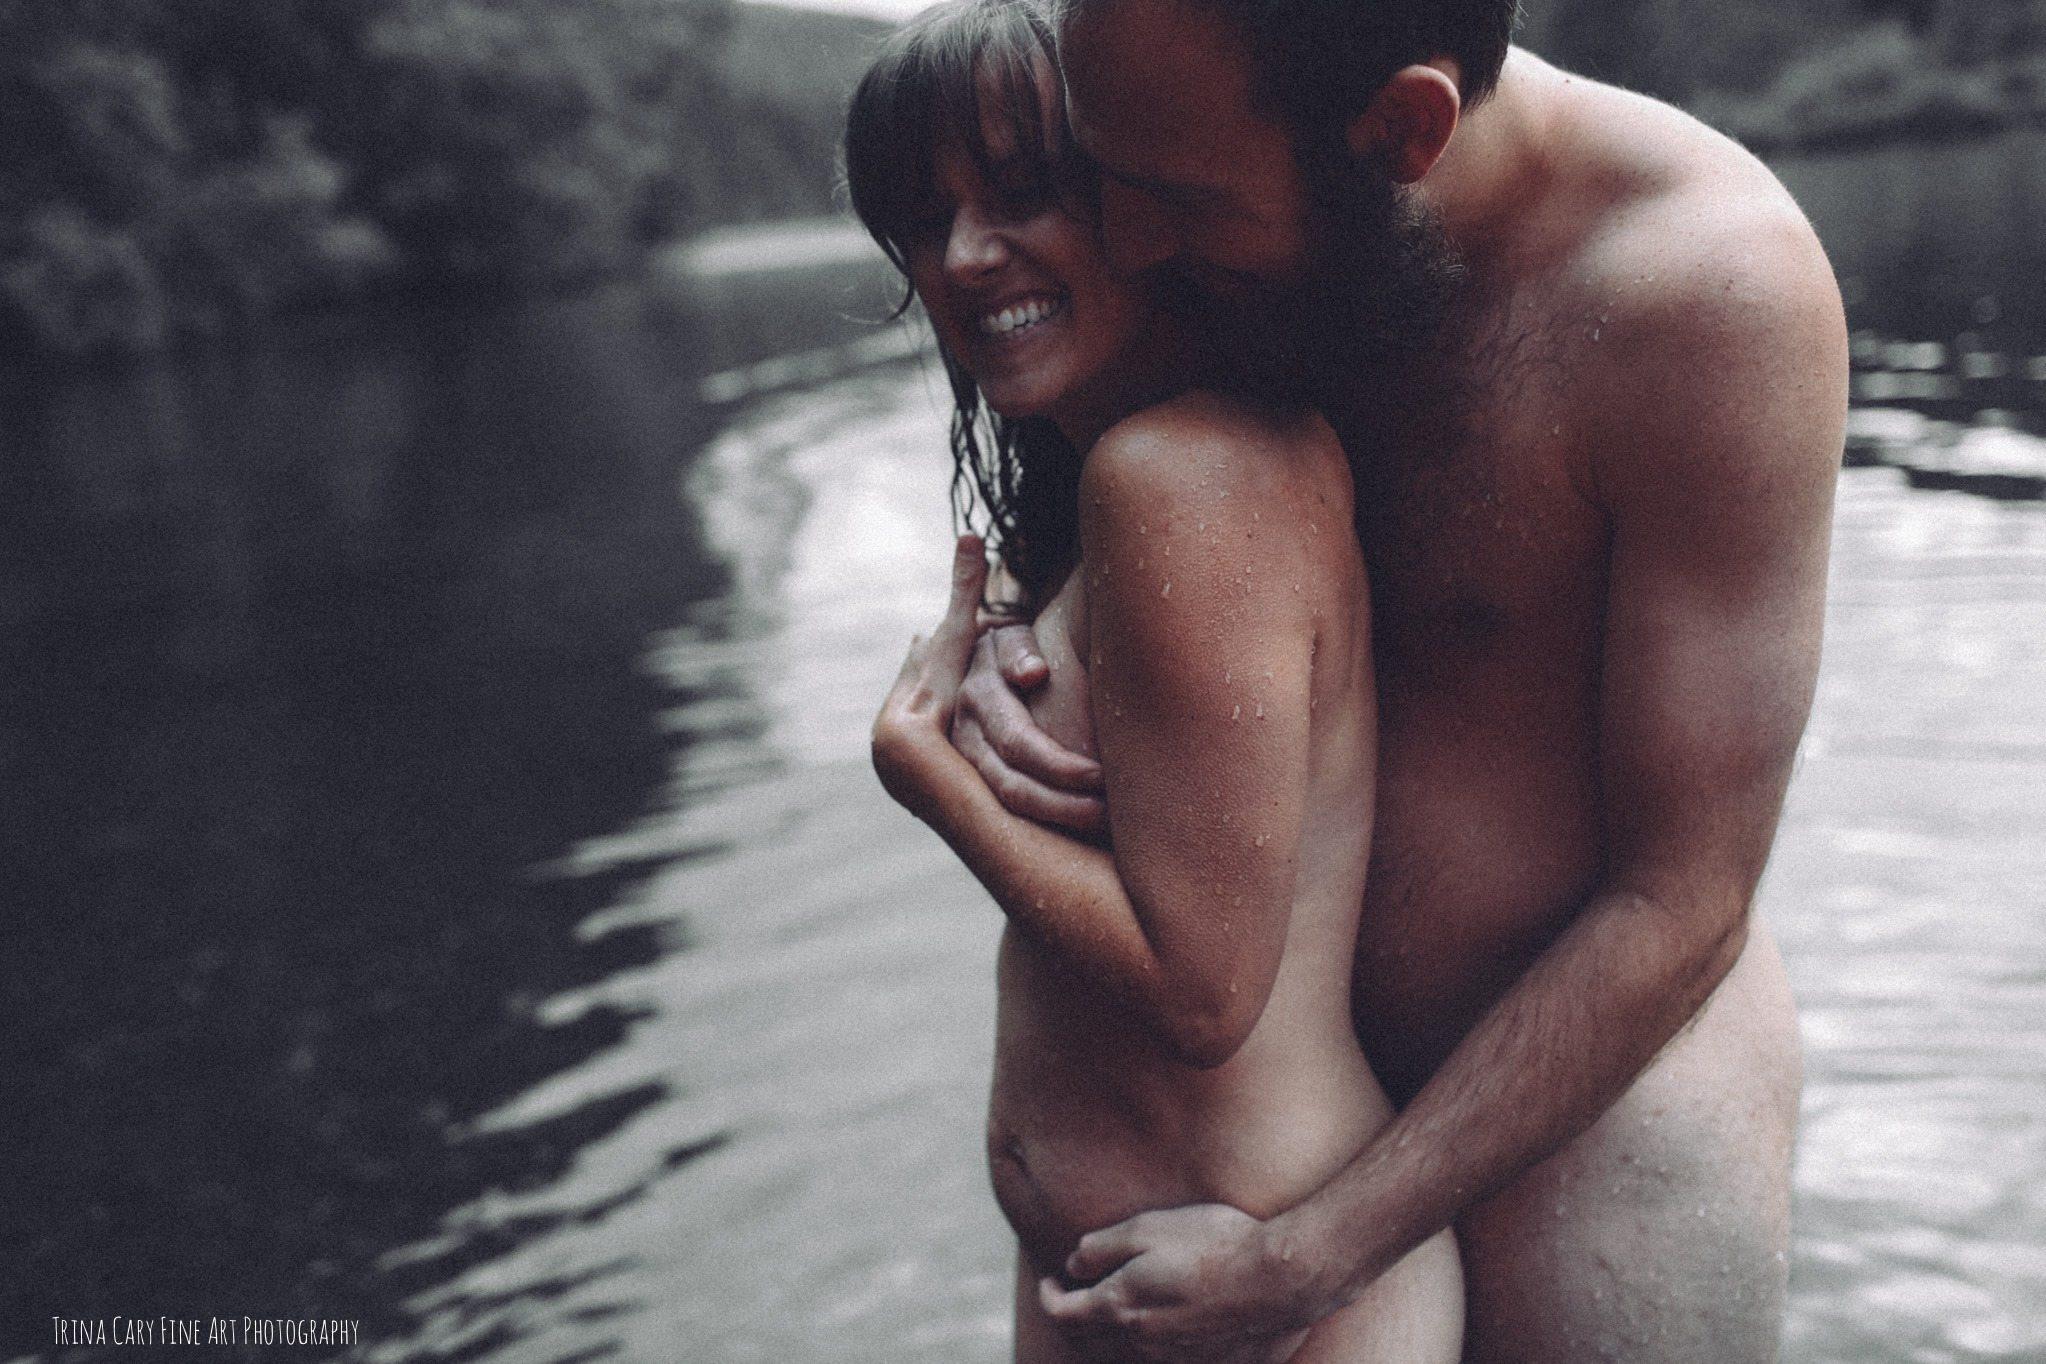 postpartum photo shoot